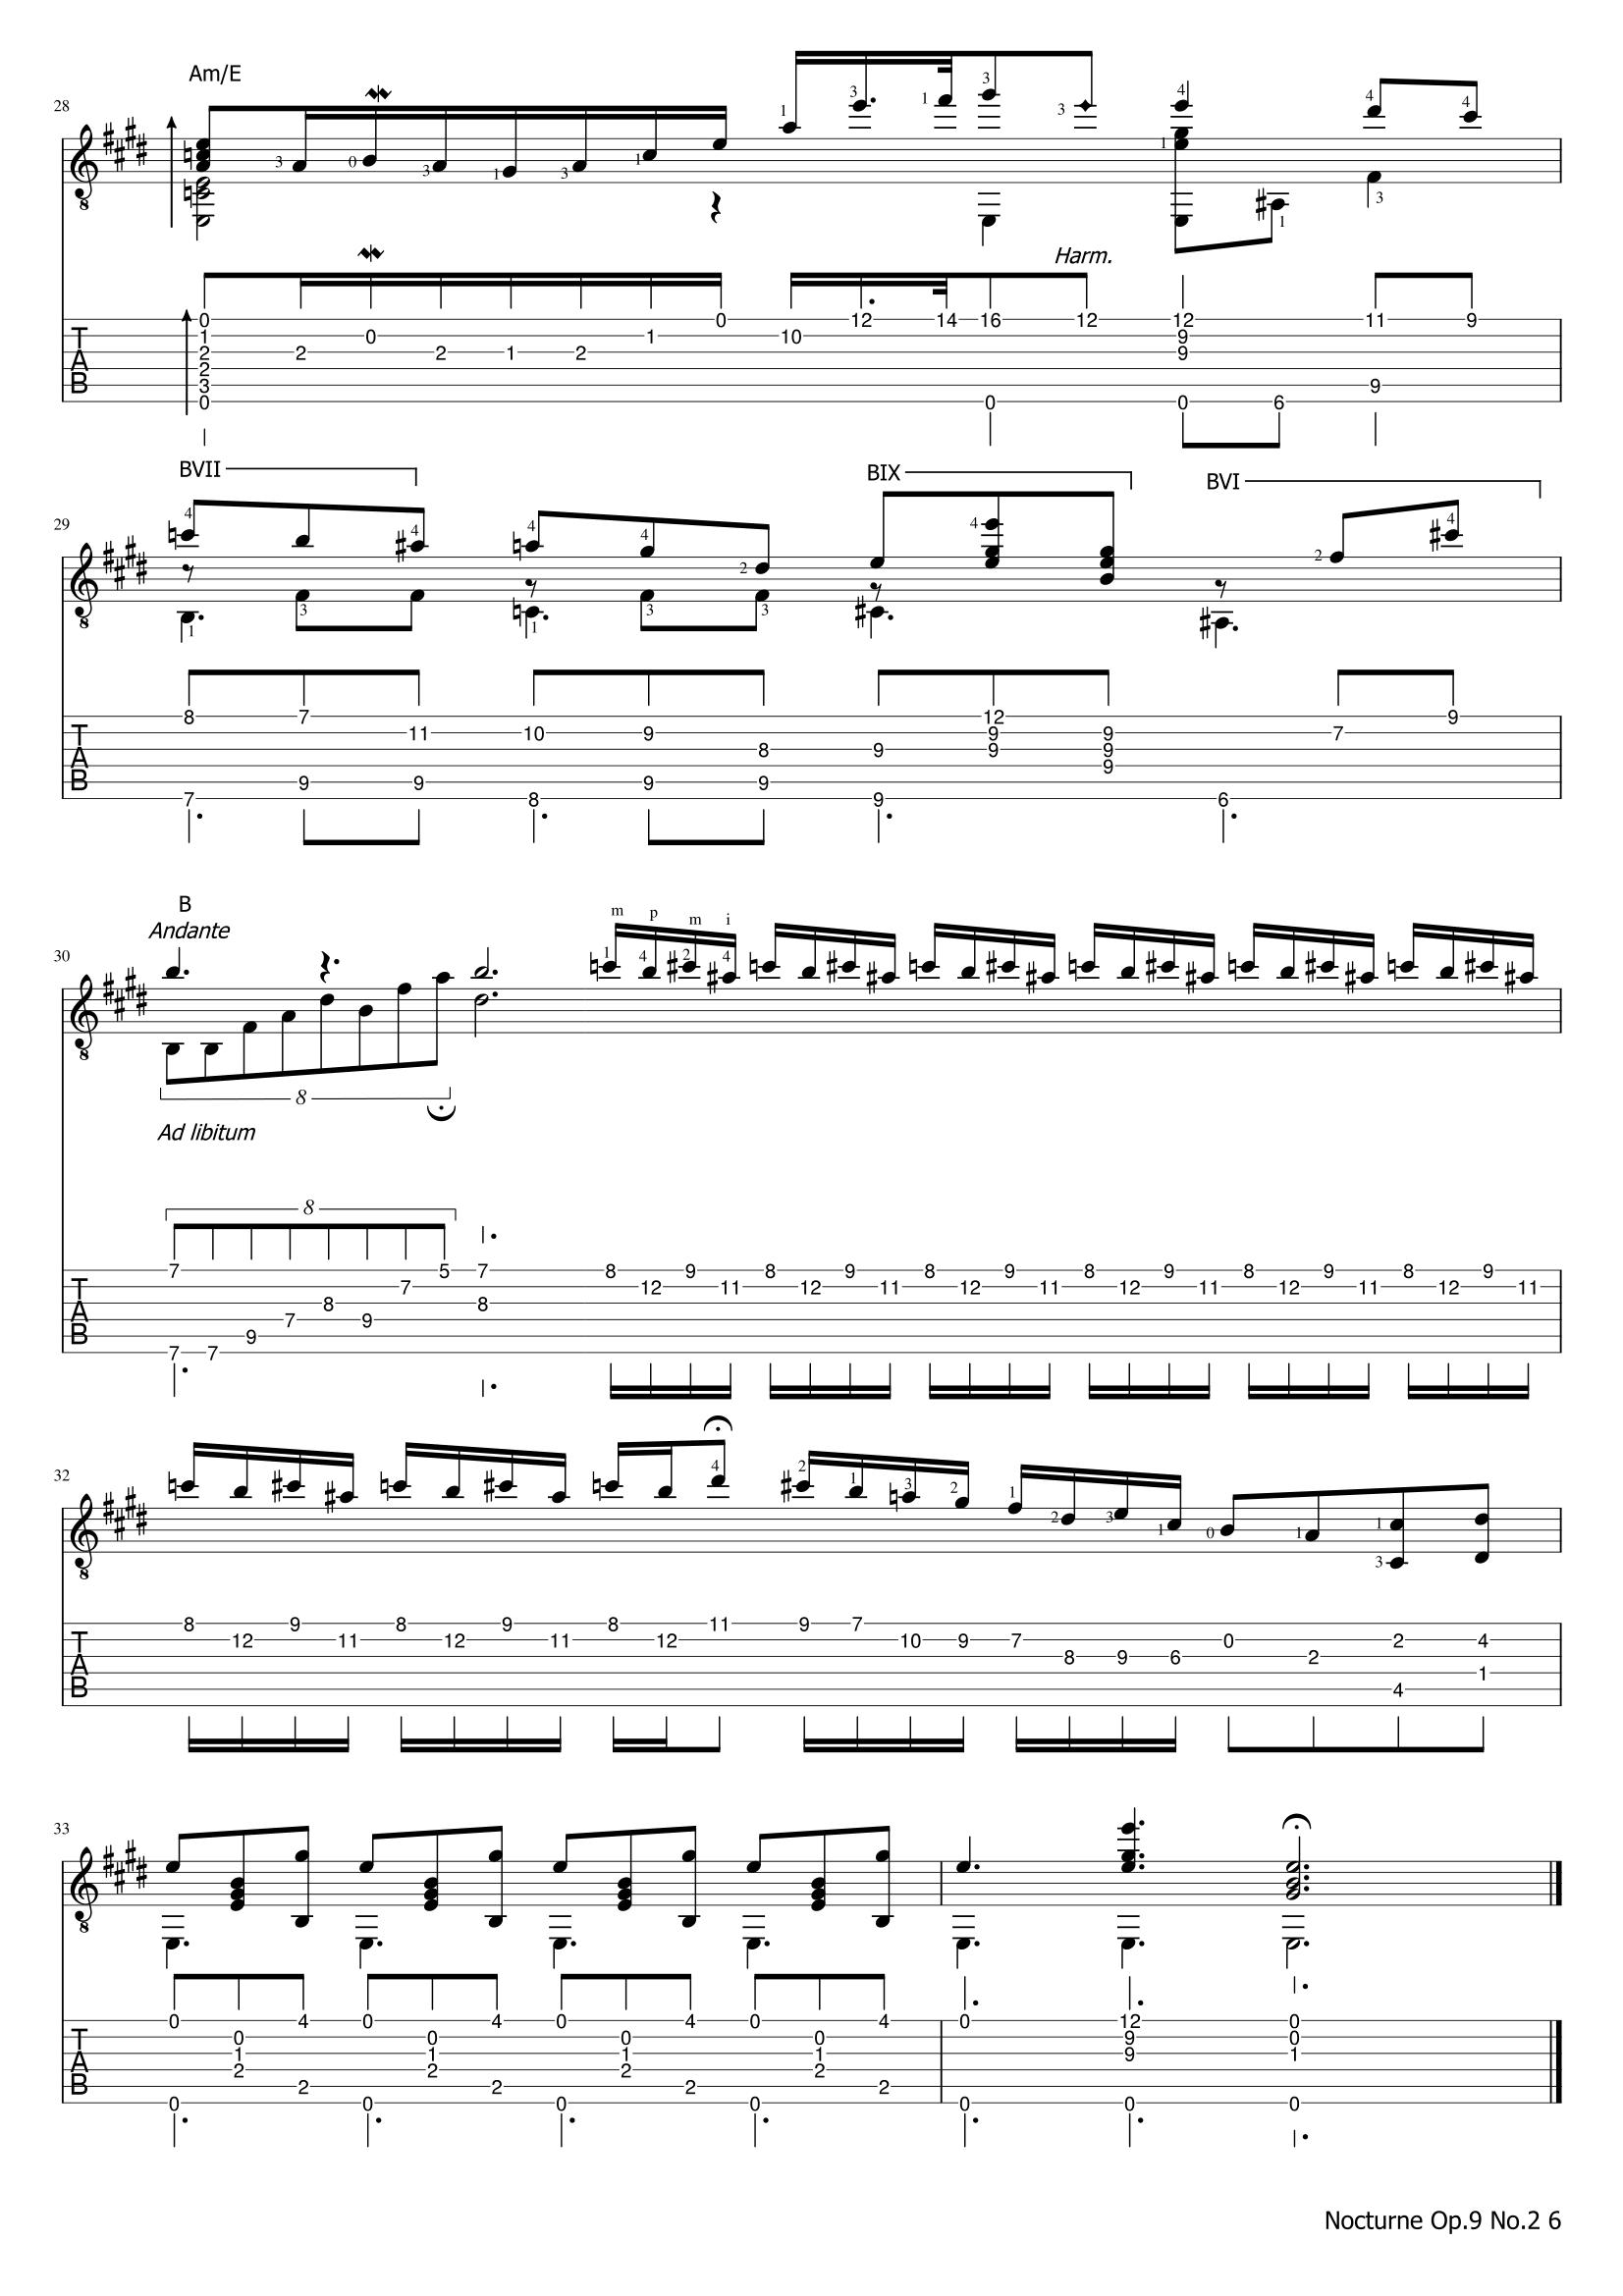 6 - Nocturne Op.9 No.2.png